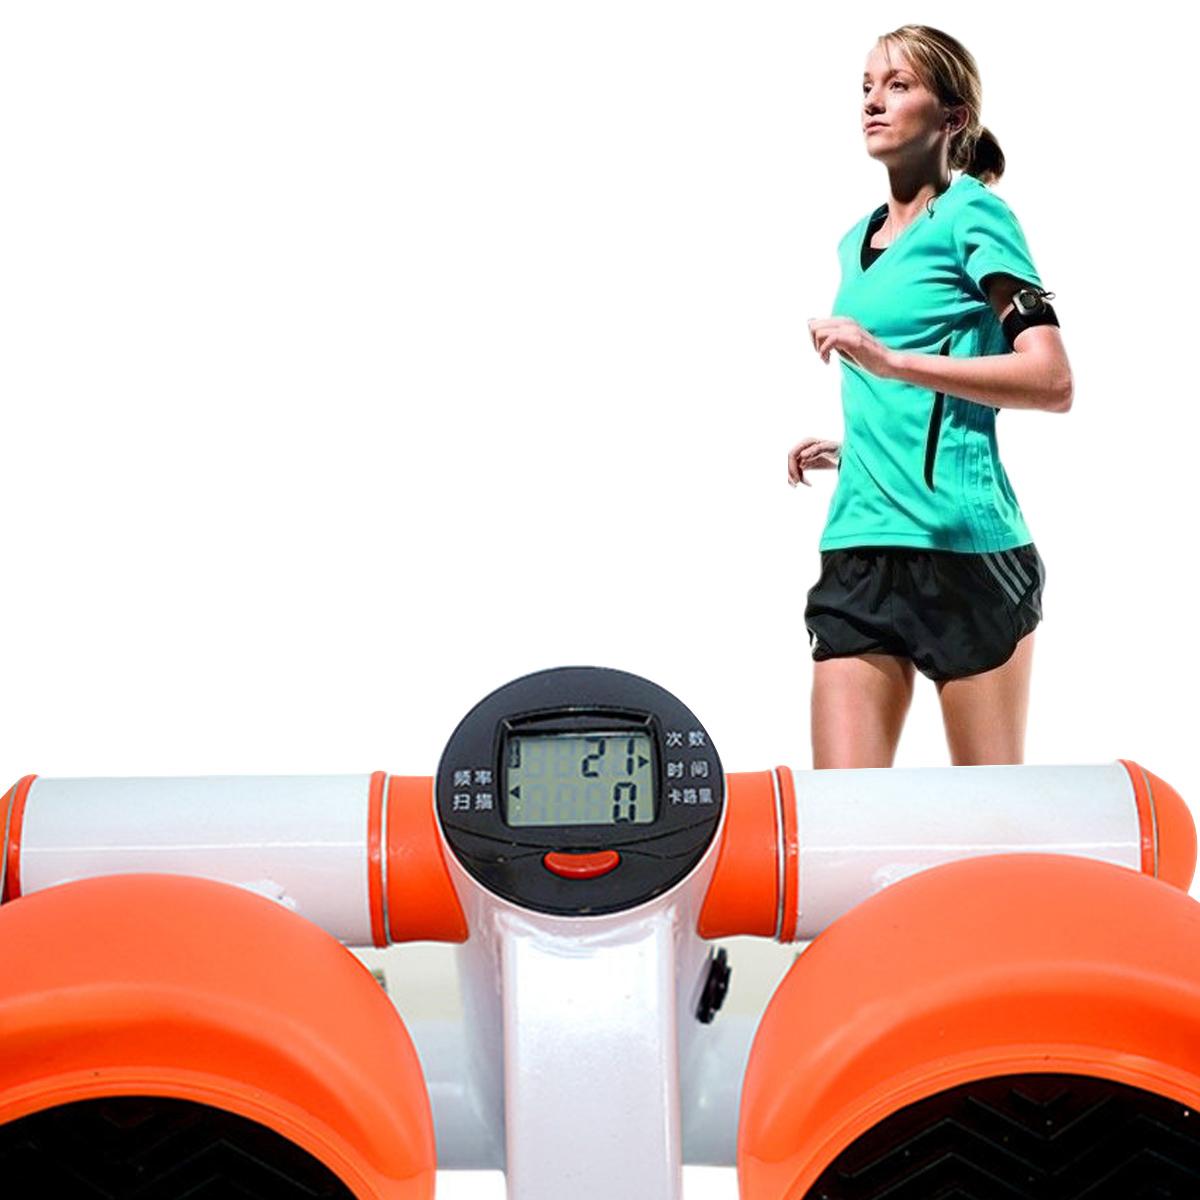 Fitness Mini Stepper Leg Trainer Cardio Sports Pedal Exerciser Fitness Sport Home Exercise Tools